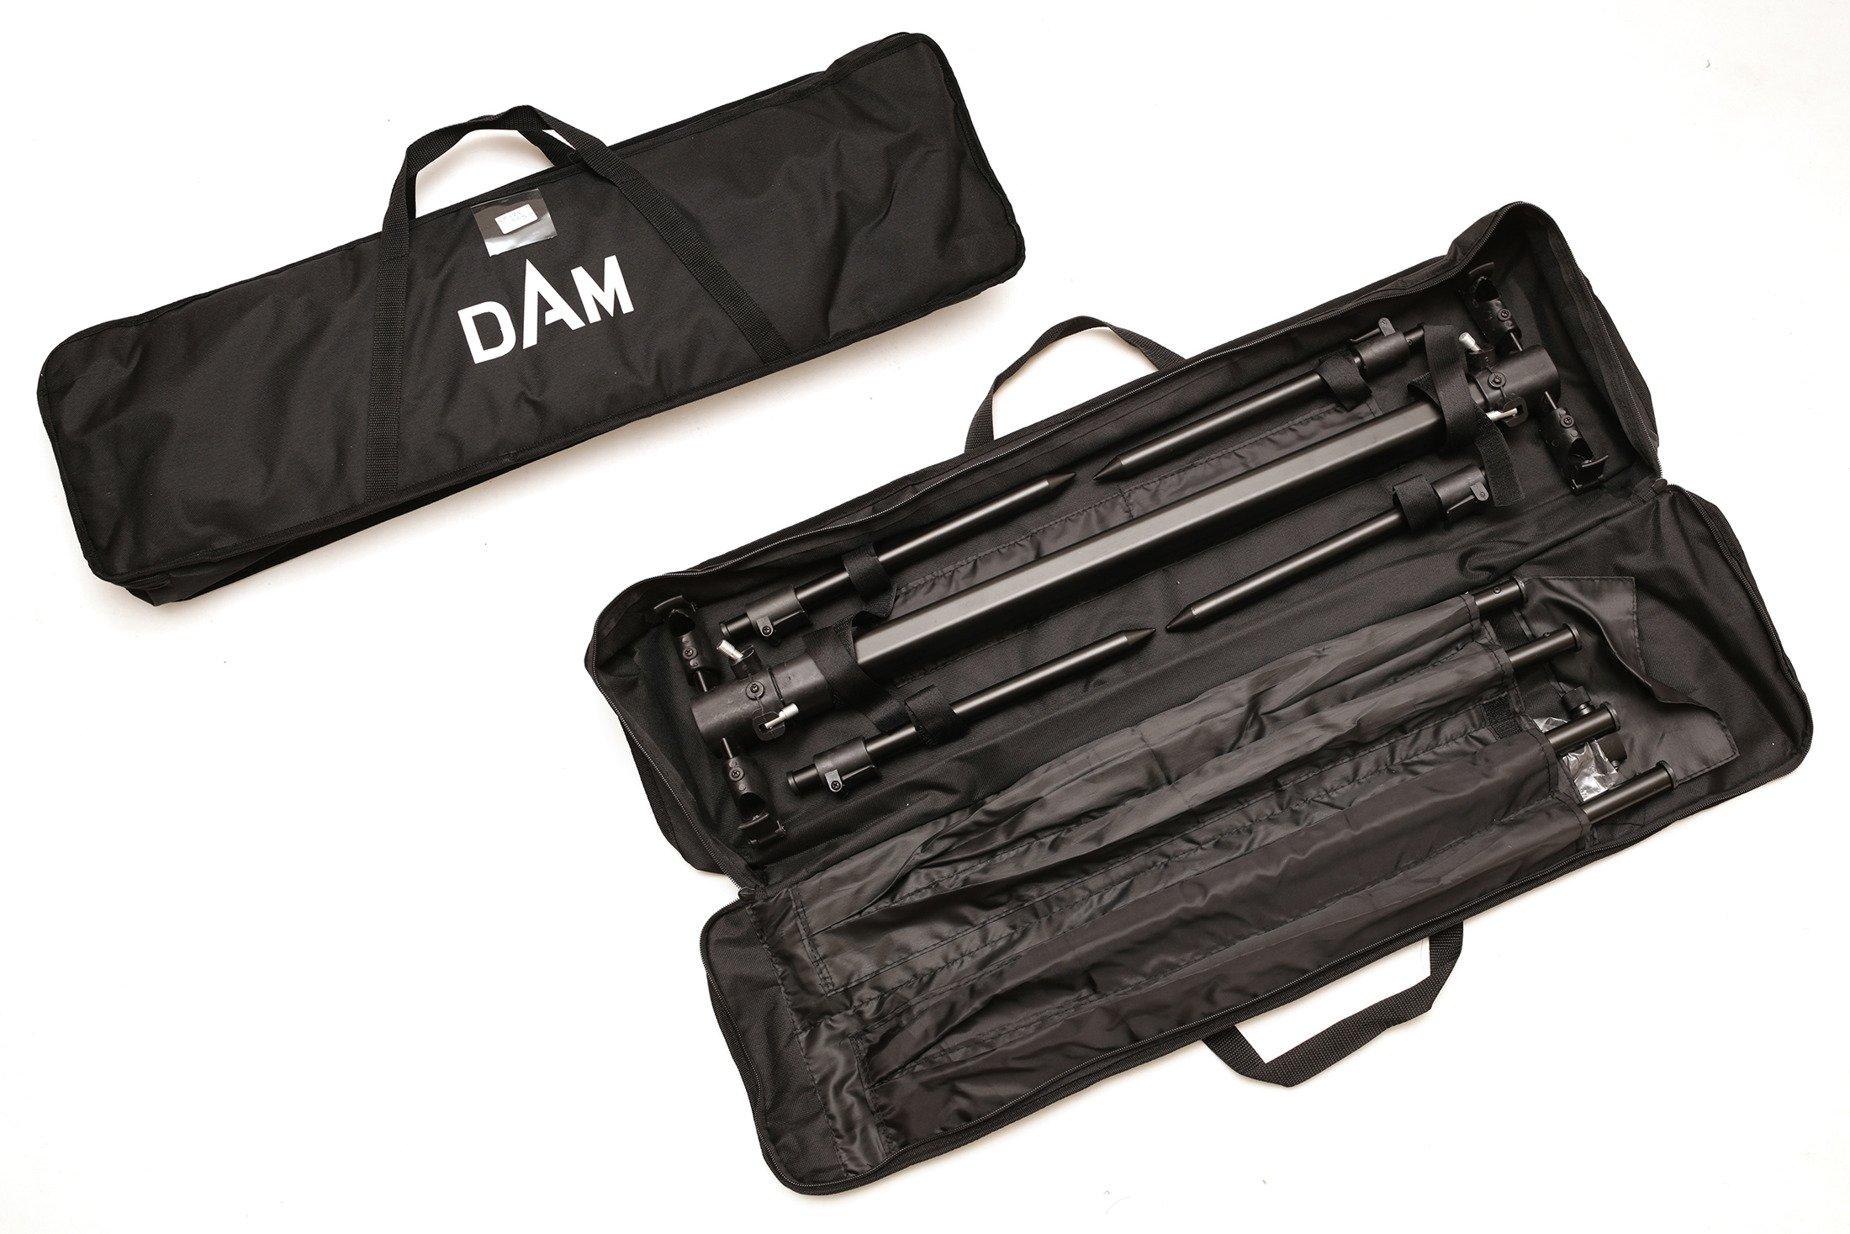 DAM Convertible Rod Pod 4 Rod